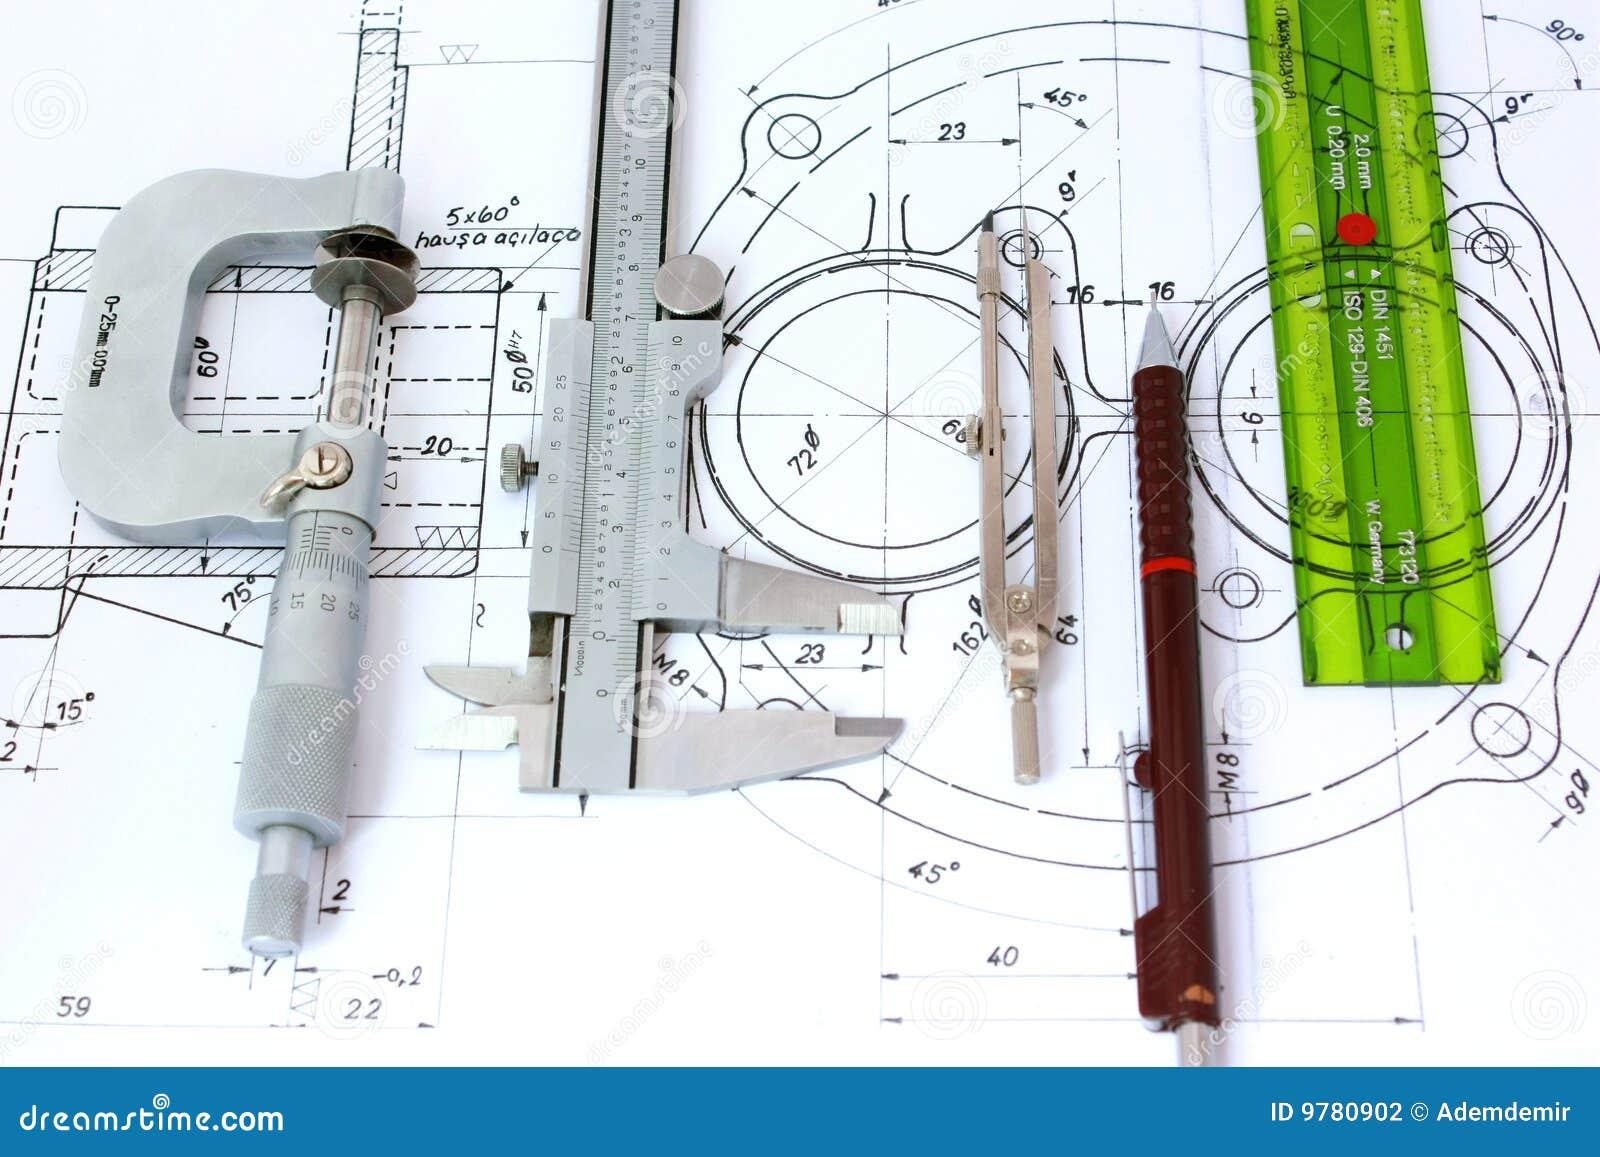 Mechanical Engineering Tools : Five engineering tools on blueprint stock photography